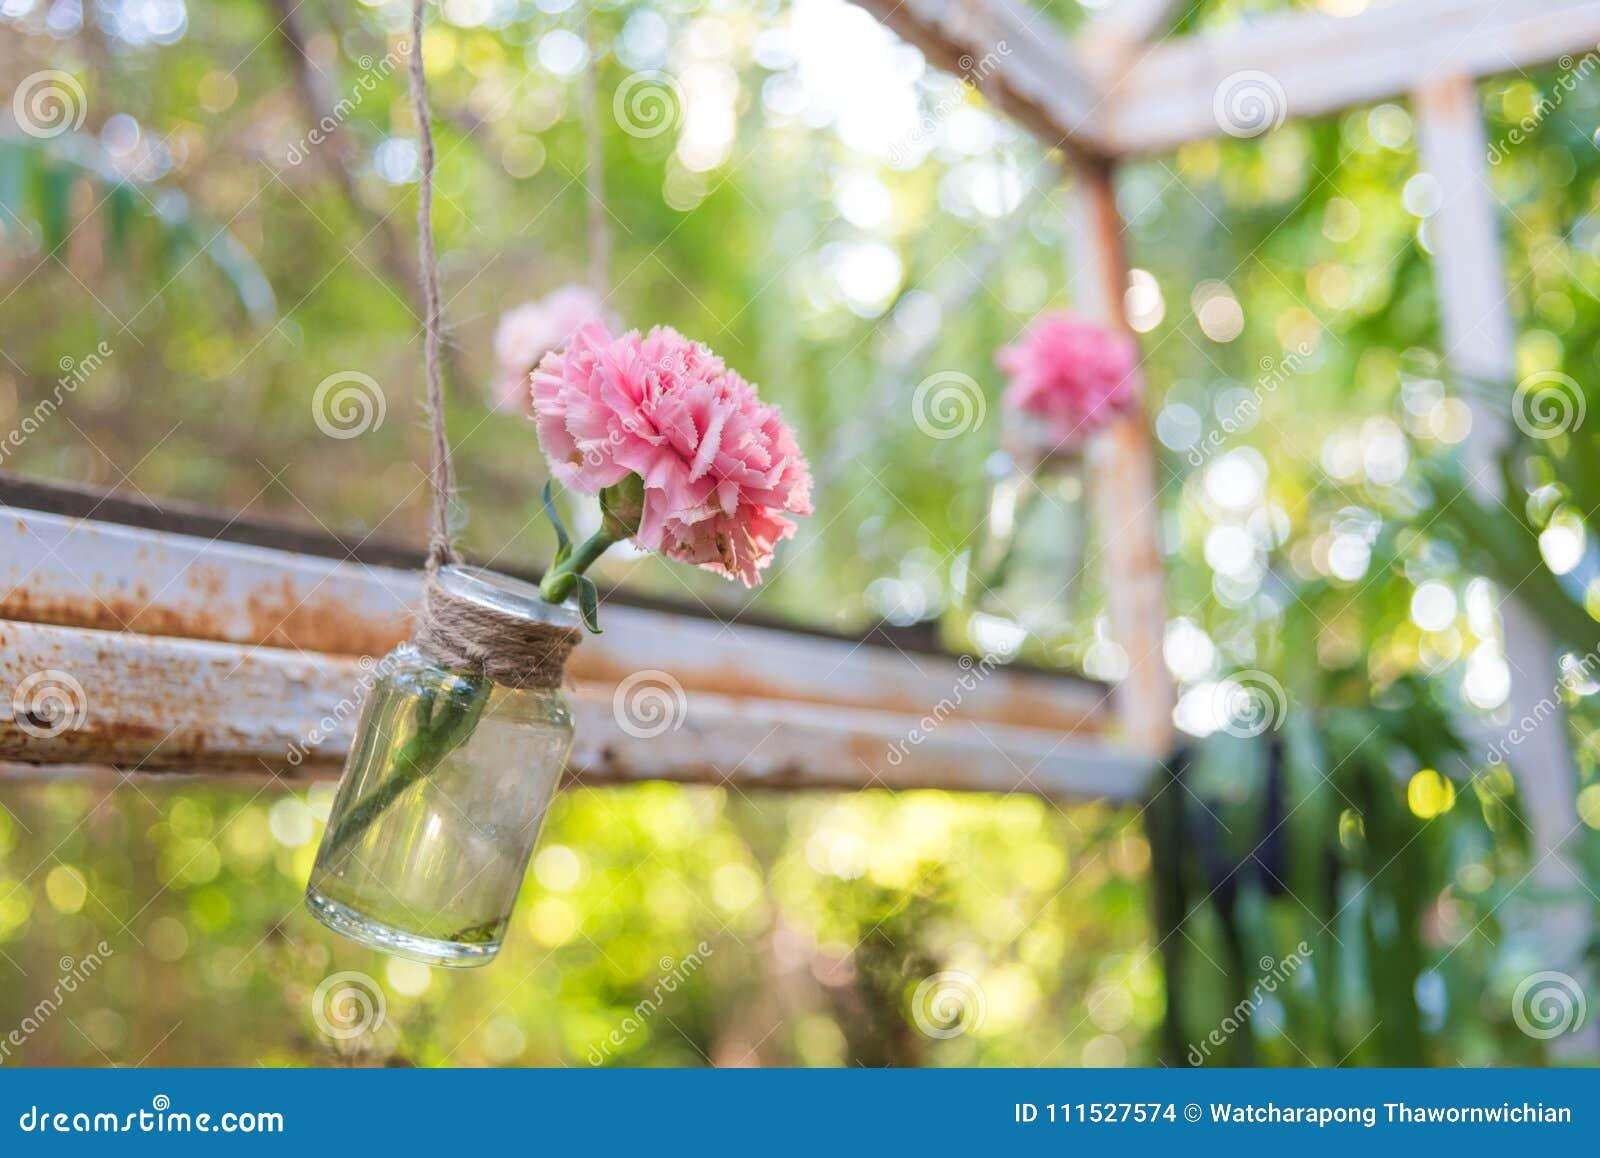 hanging flower vase stock photo image of rope create 111527574